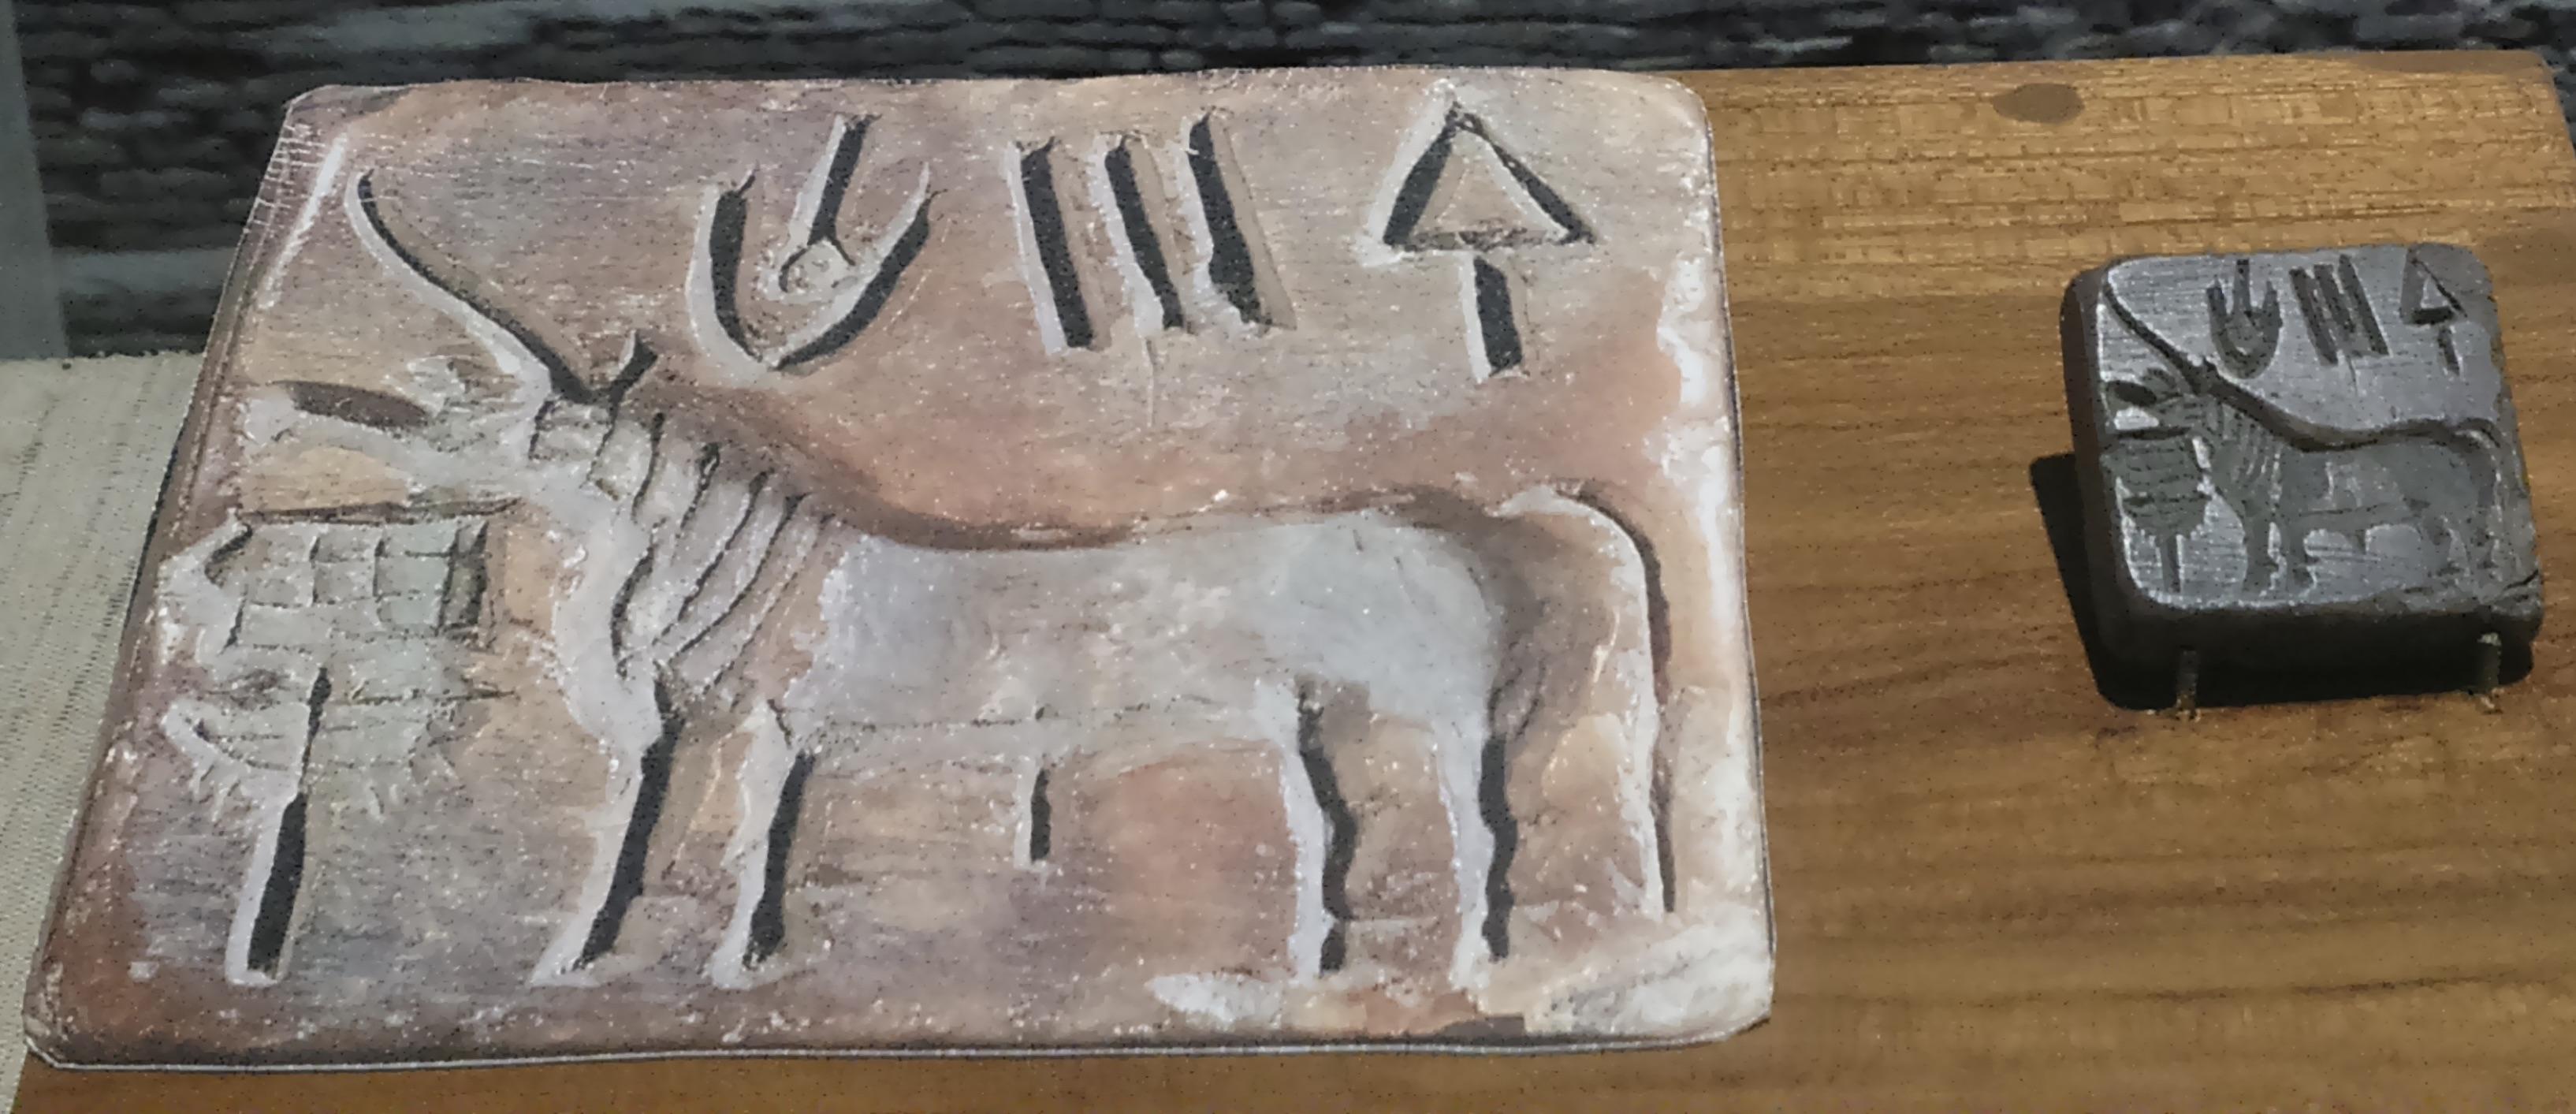 Indus_civilisation_seal_unicorn_at_Indian_Museum,_Kolkata